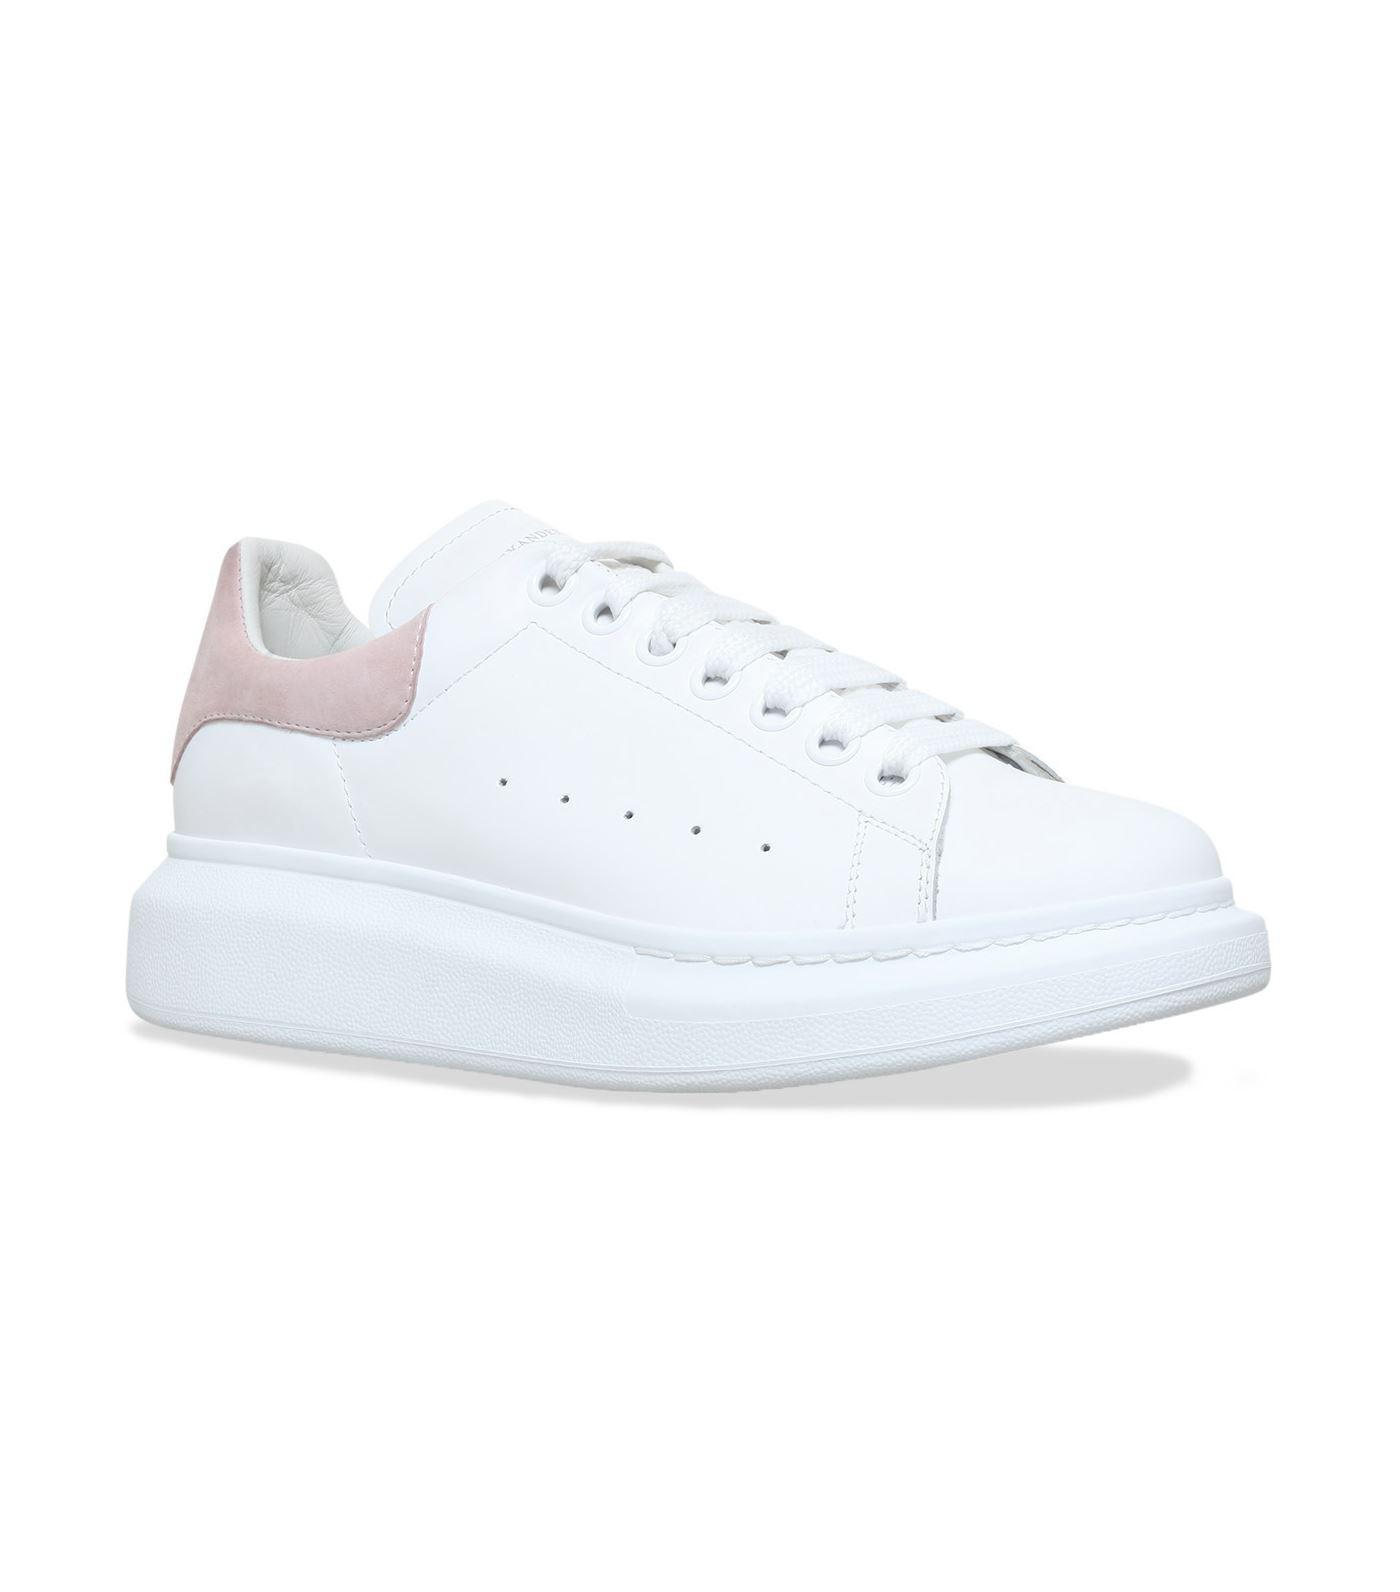 Alexander McQueen White Patent Leather & Mesh Sneakers XOVa5